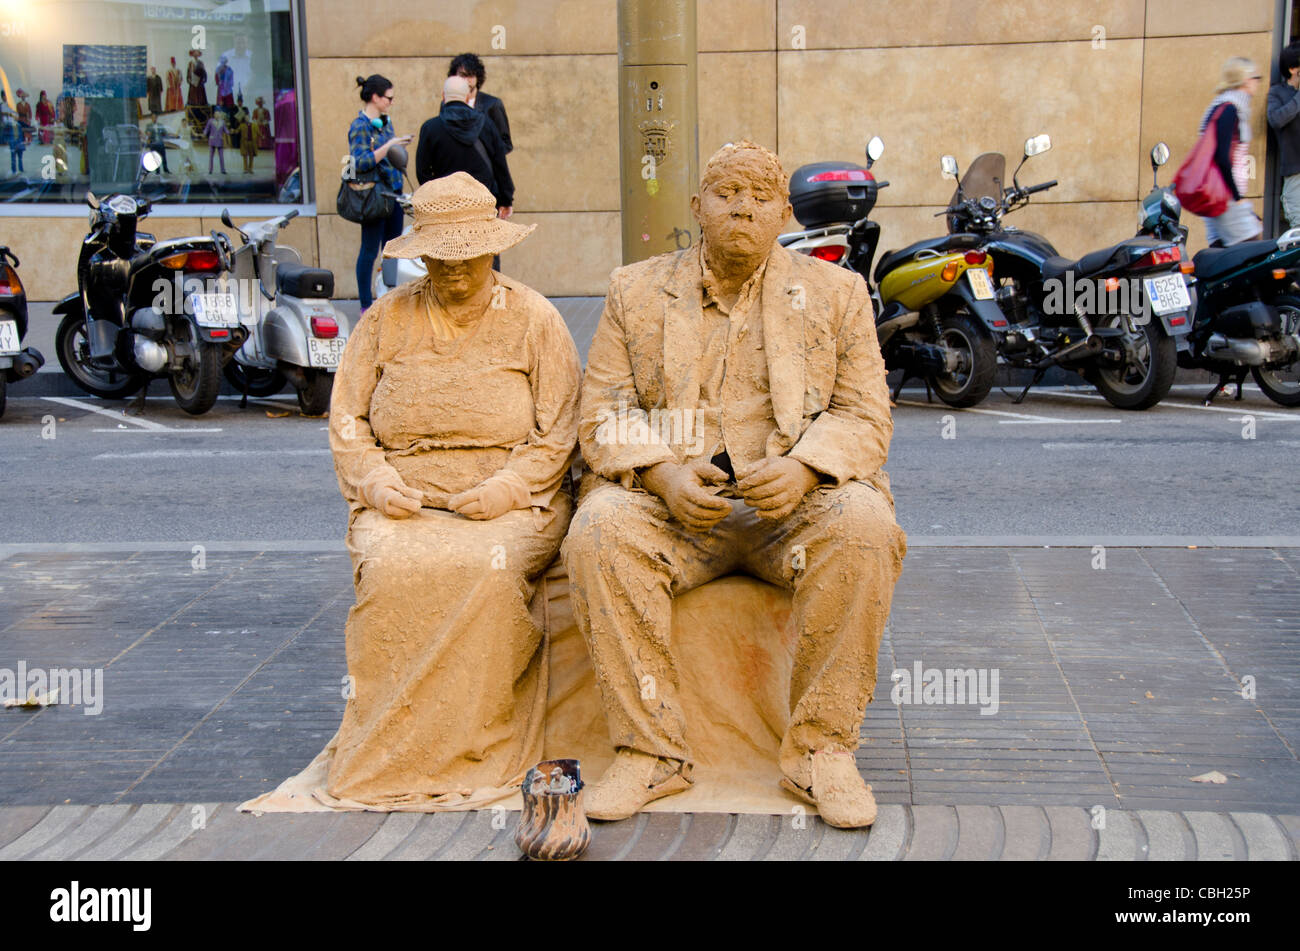 Spain, Catalunya, Barcelona. Popular downtown pedestrian street, La Rambla. Typical street mime with tip jar along - Stock Image